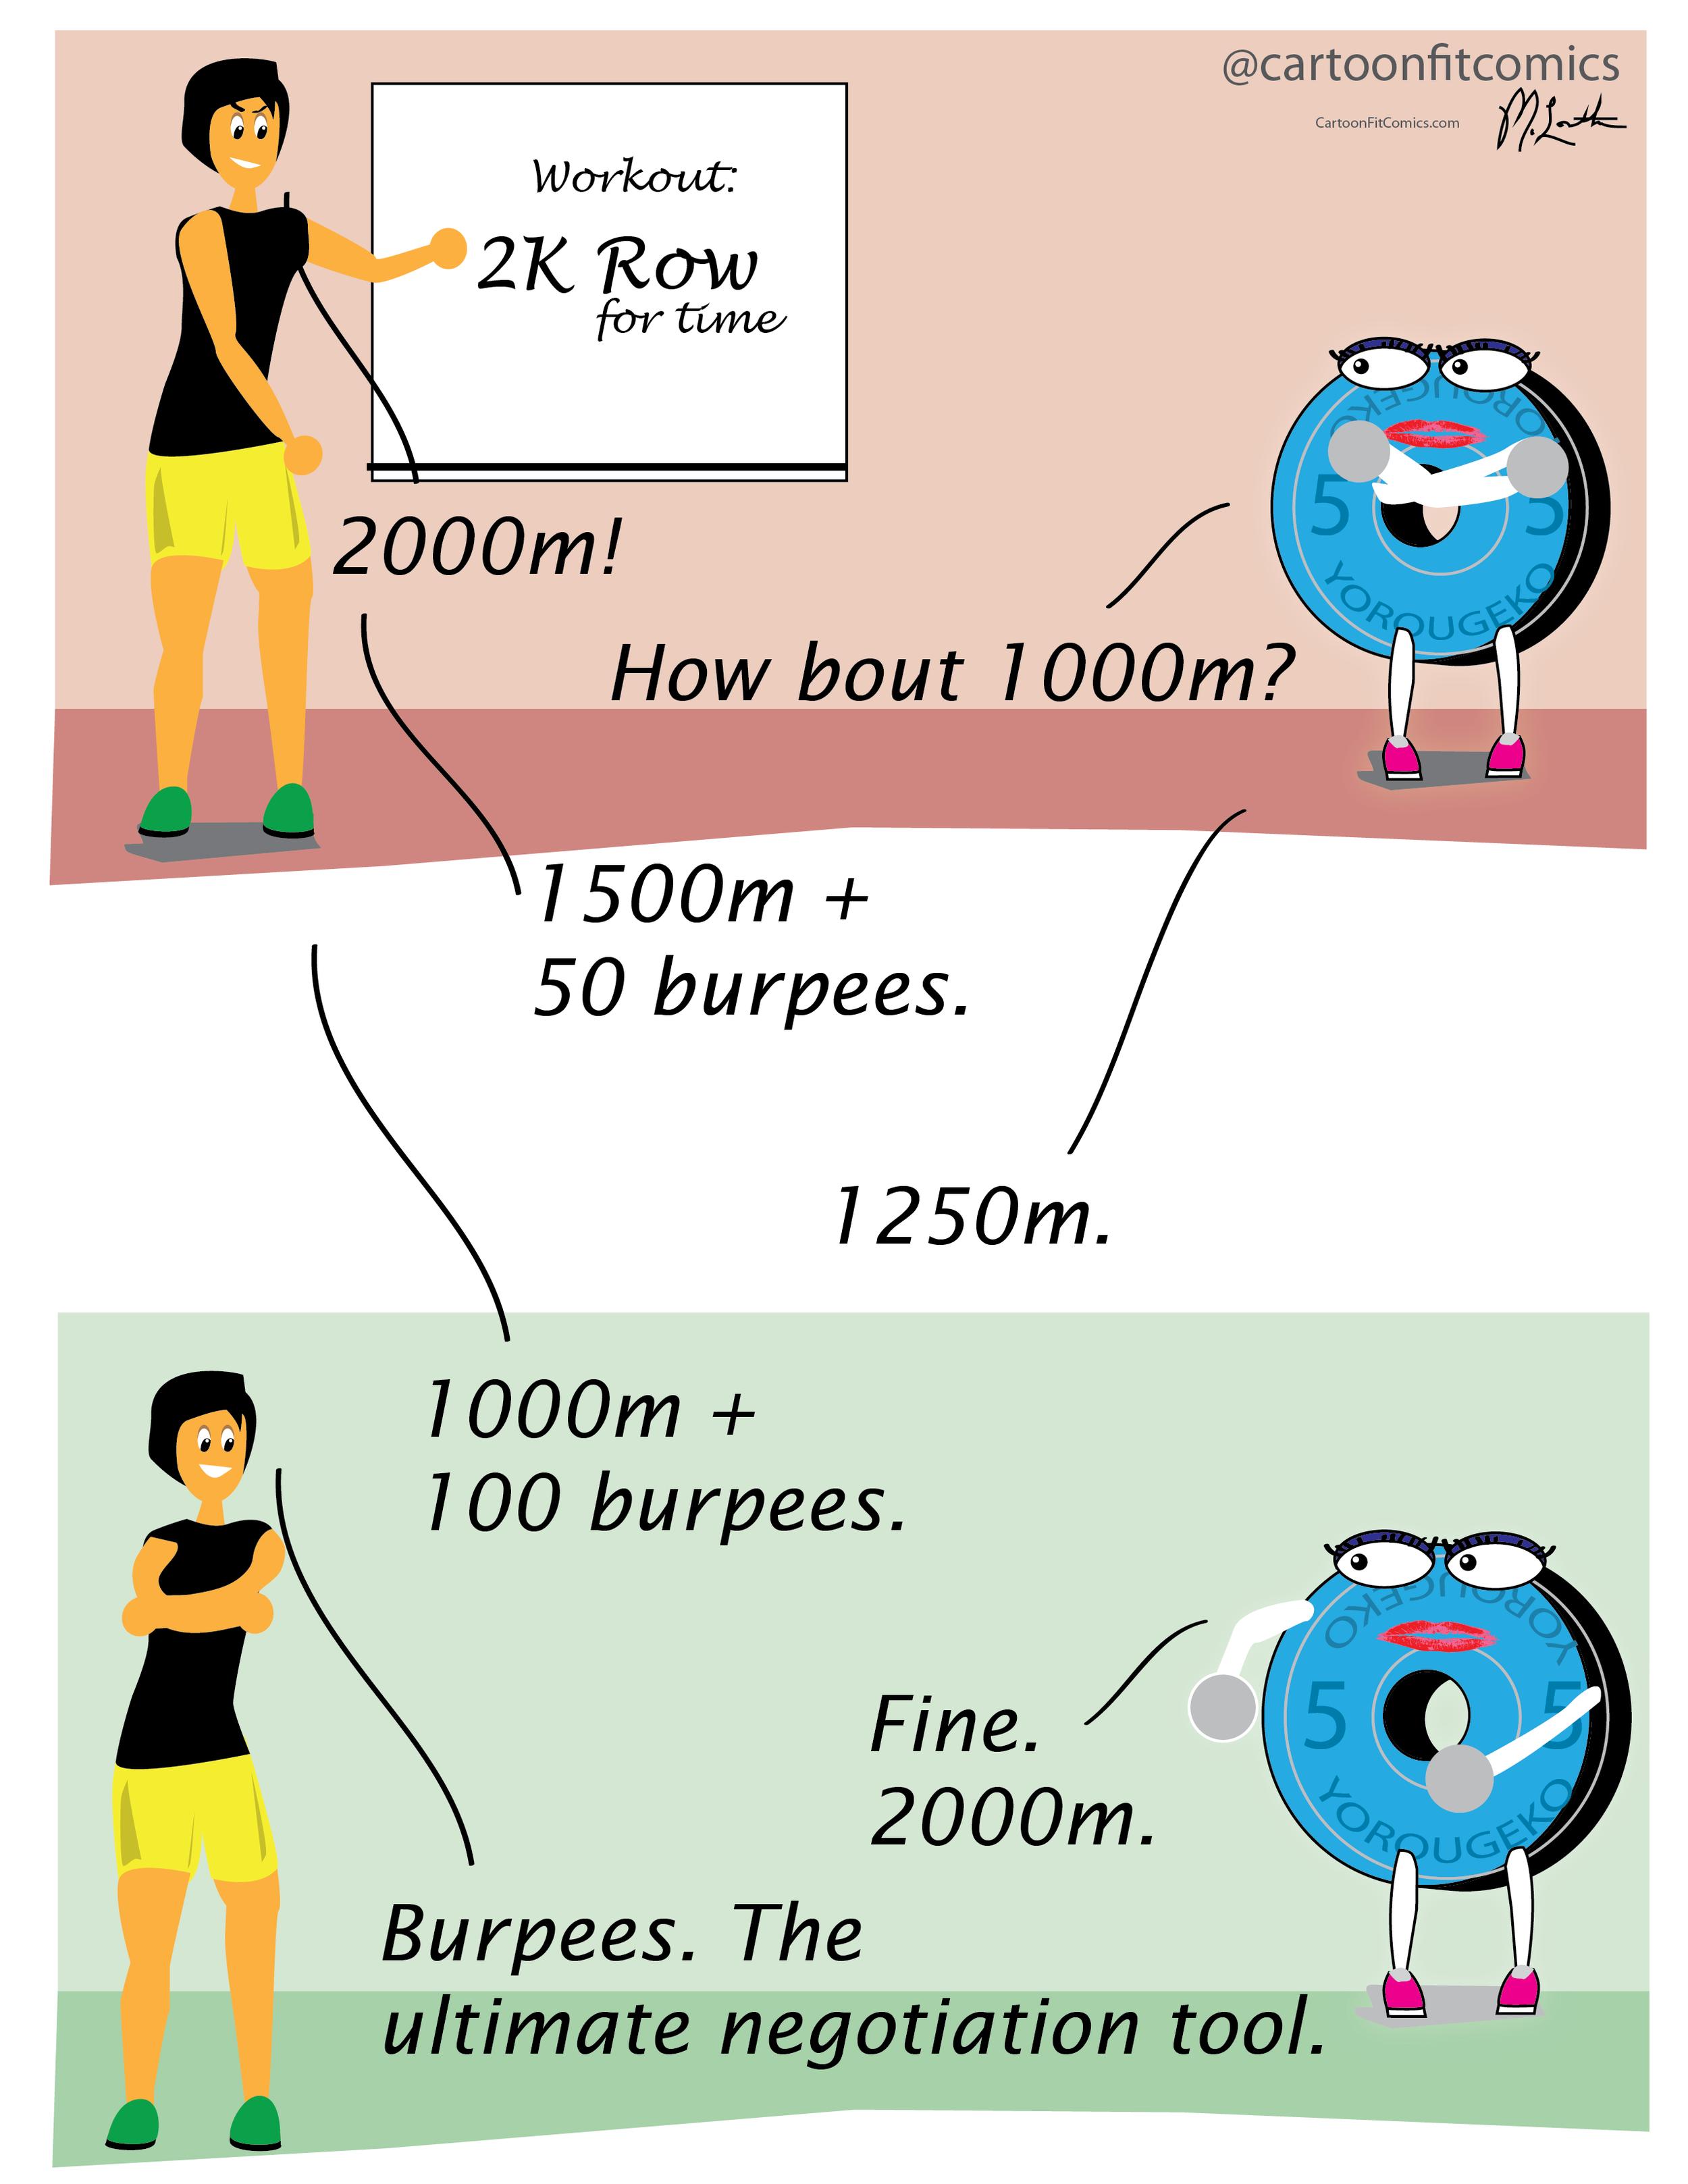 CrossFit workout negotiations - CartoonFit Comics - Tina